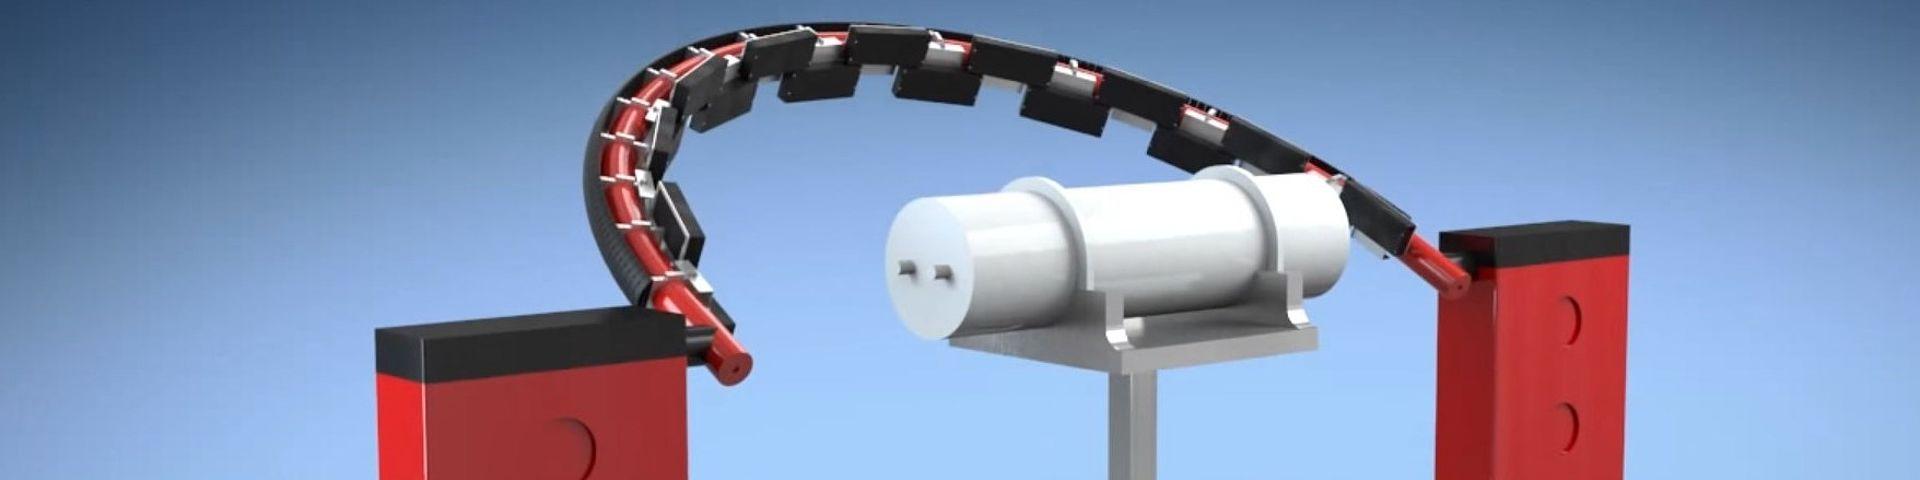 XLS X-Ray Leakage System - PTW Freiburg GmbH